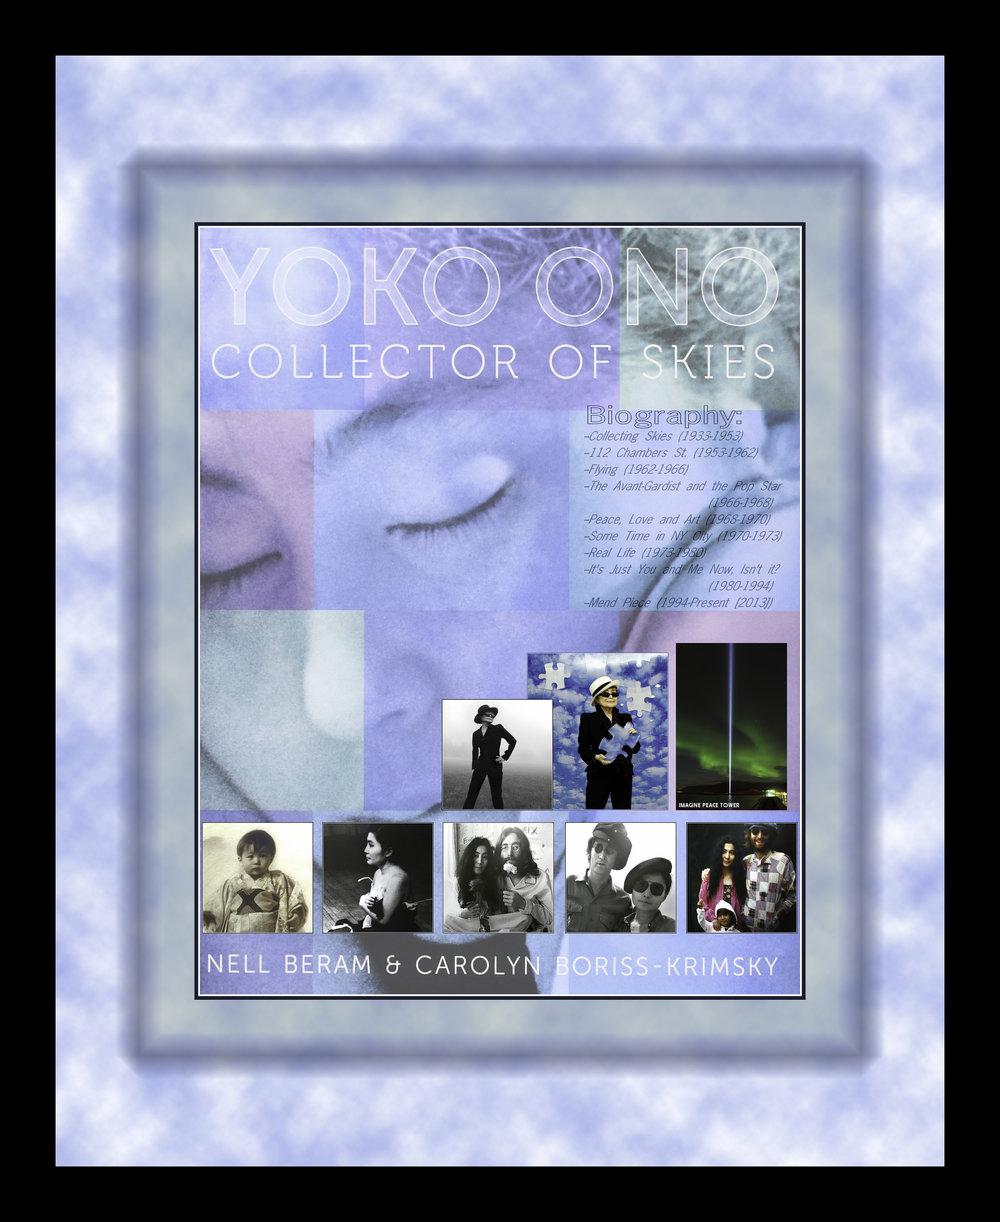 DK Book Club Compositing-5.jpg